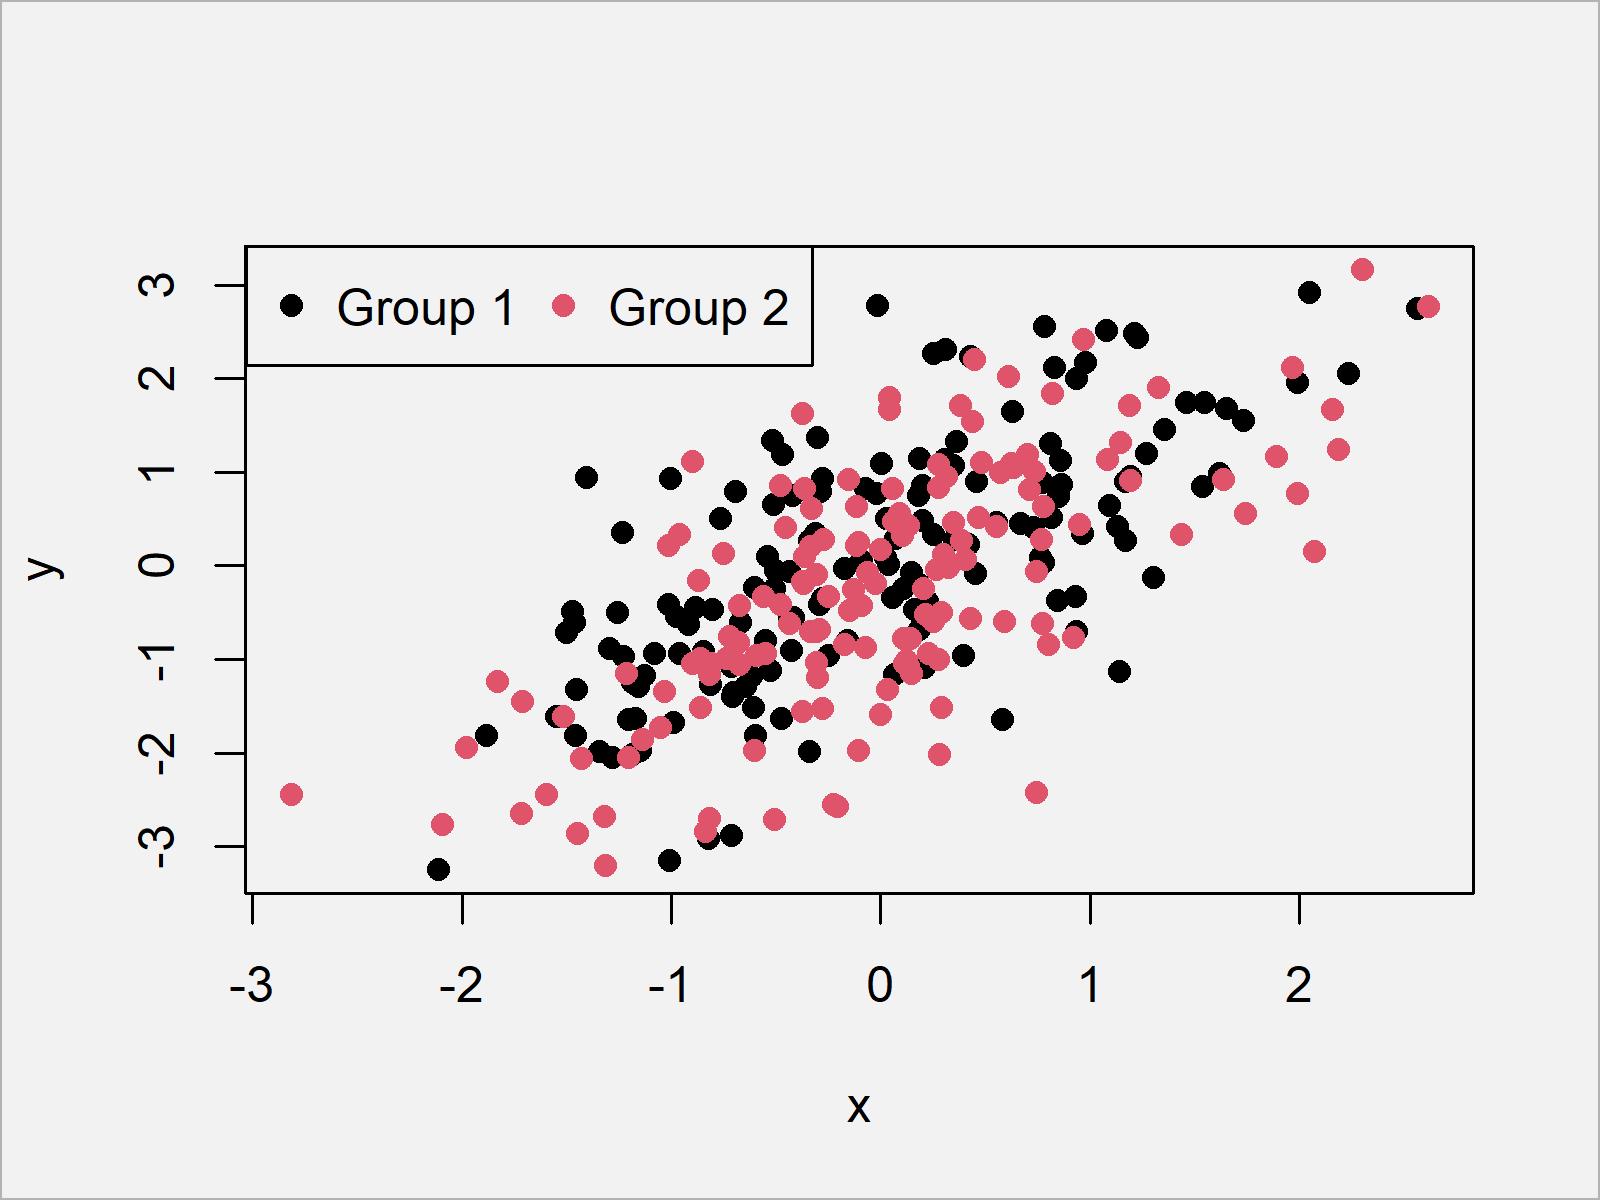 r graph figure 7 add legend base